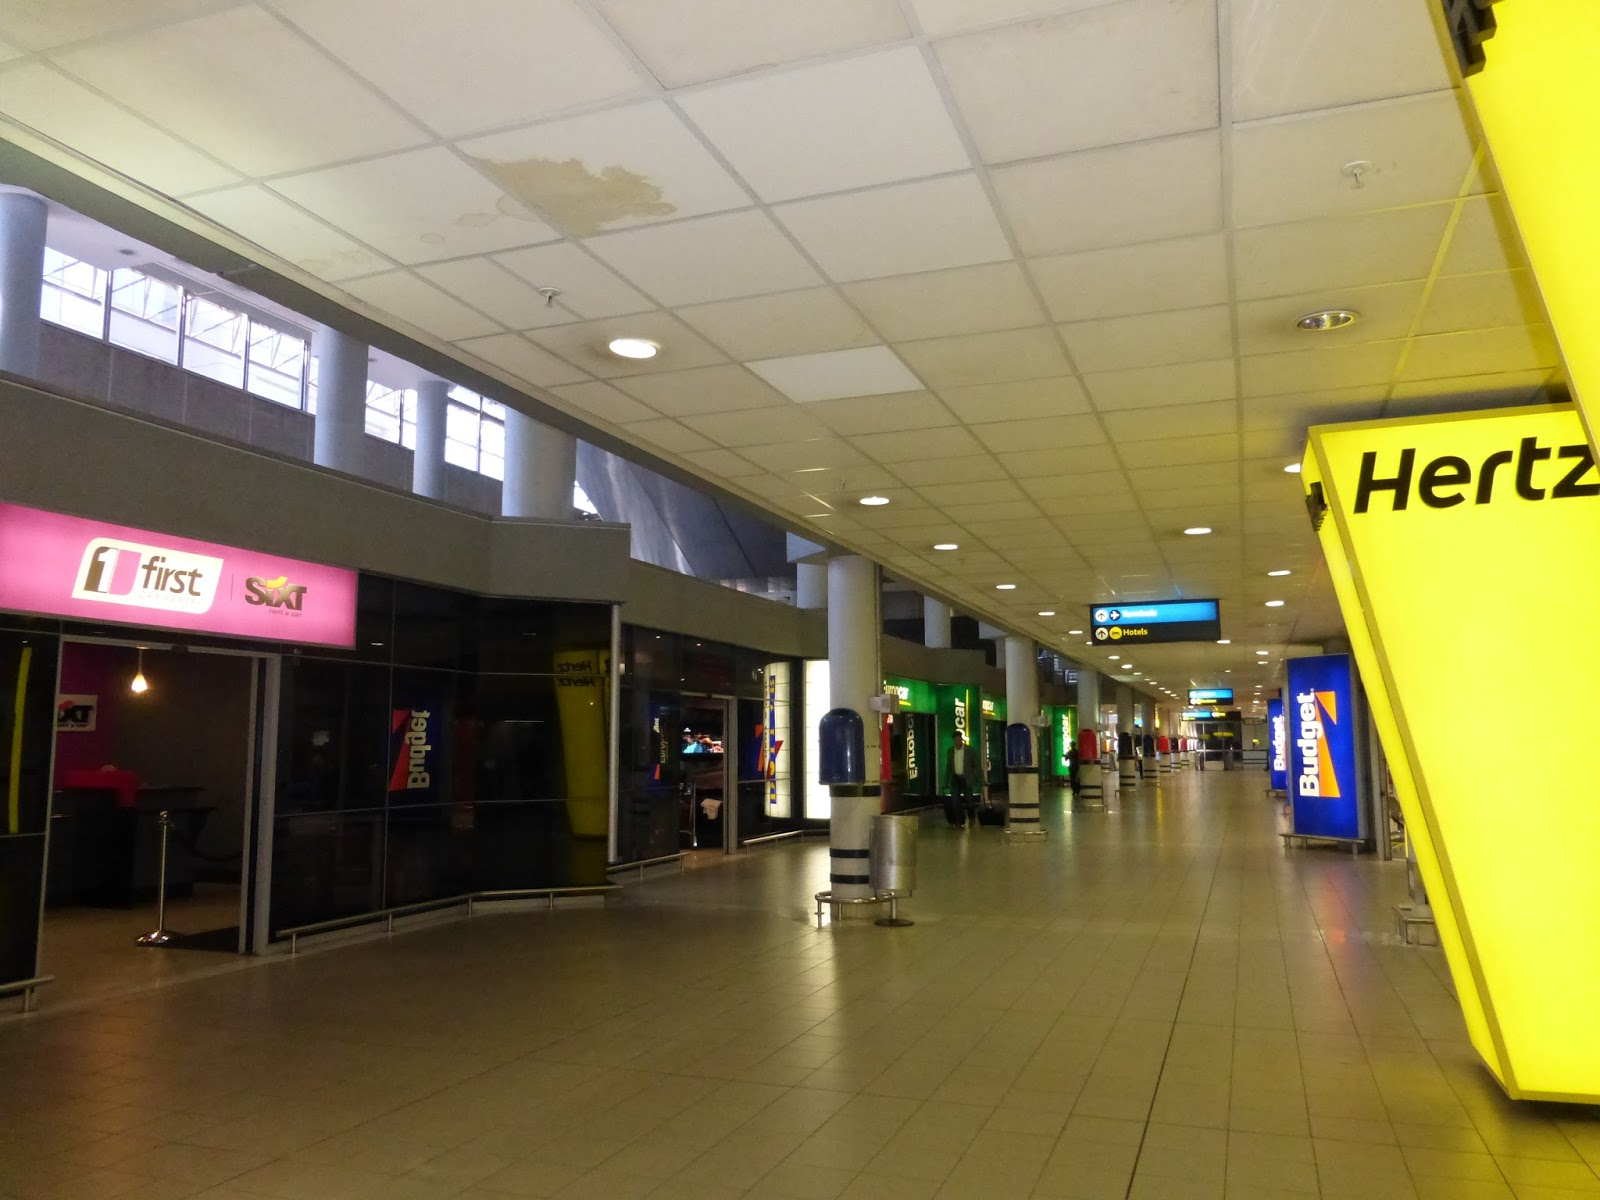 Johannesburg airport car rental companies